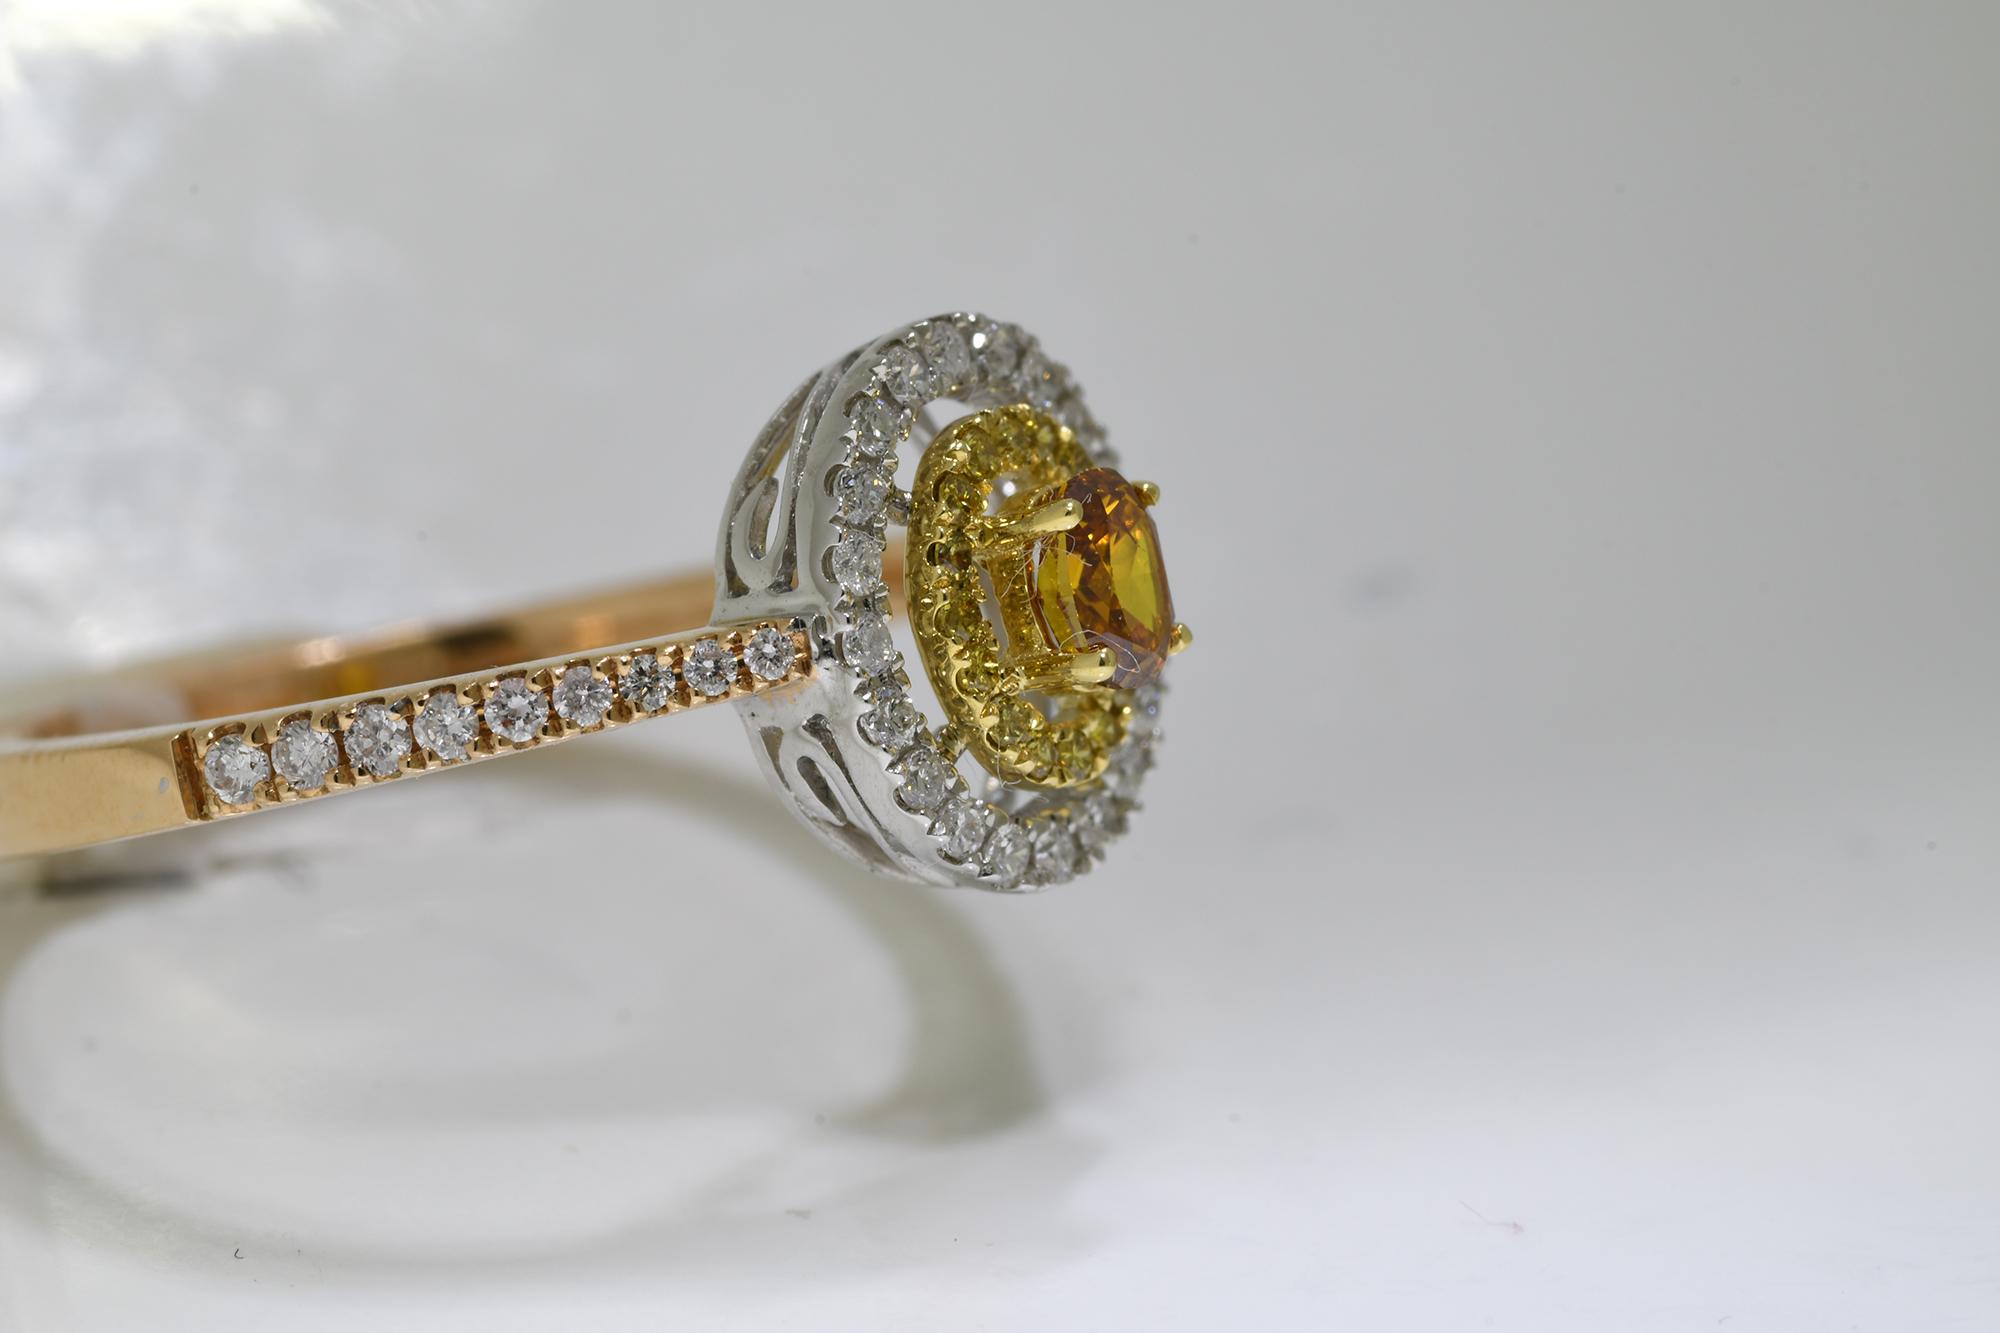 Oval Cognac Diamond Ring - Image 2 of 4